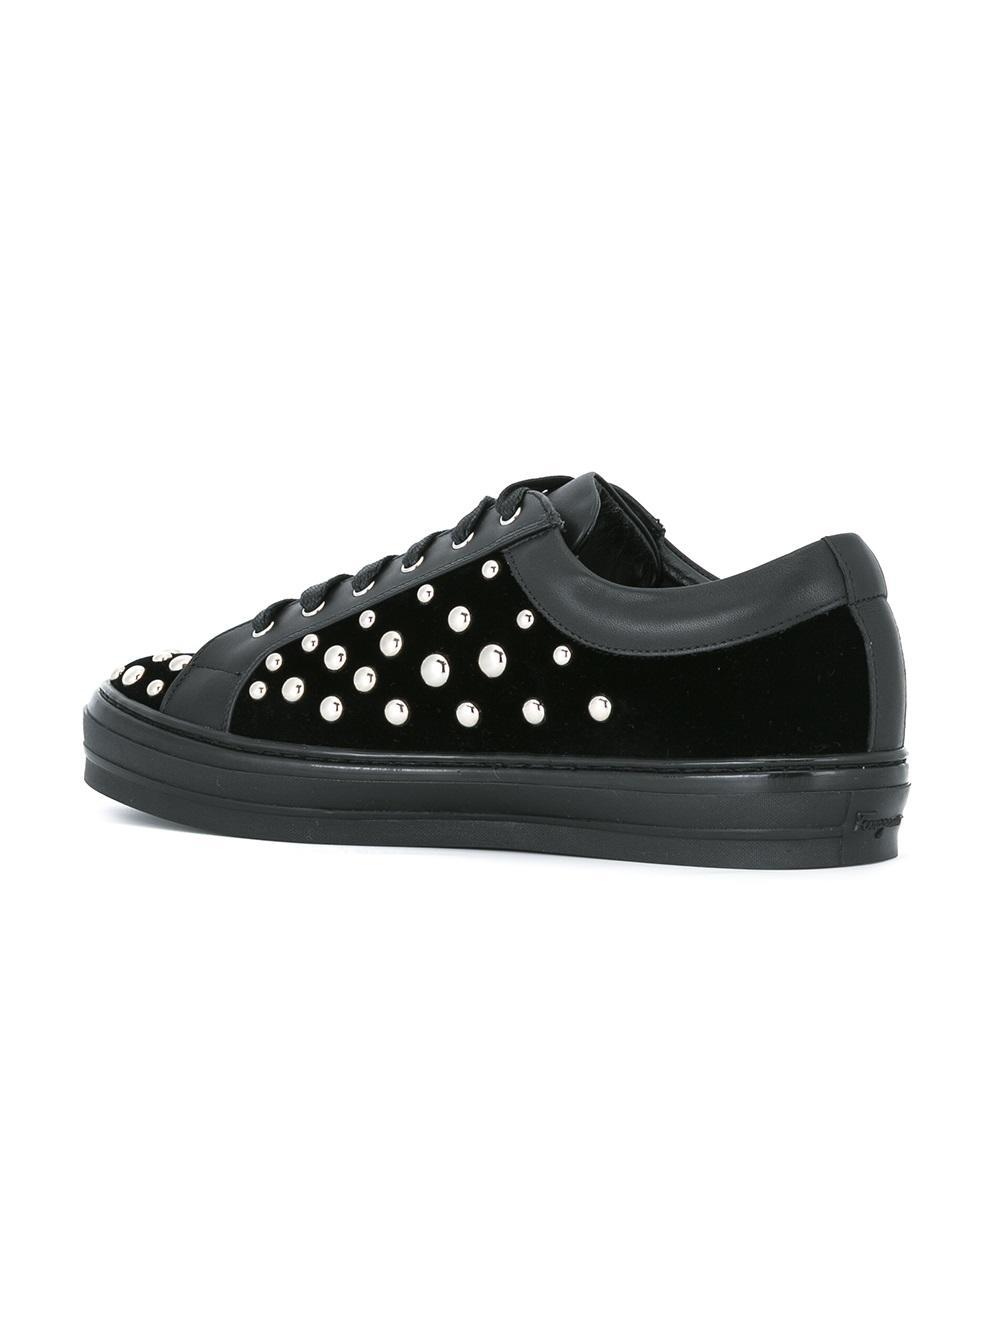 Ferragamo Leather 'liu Rock' Sneakers in Black